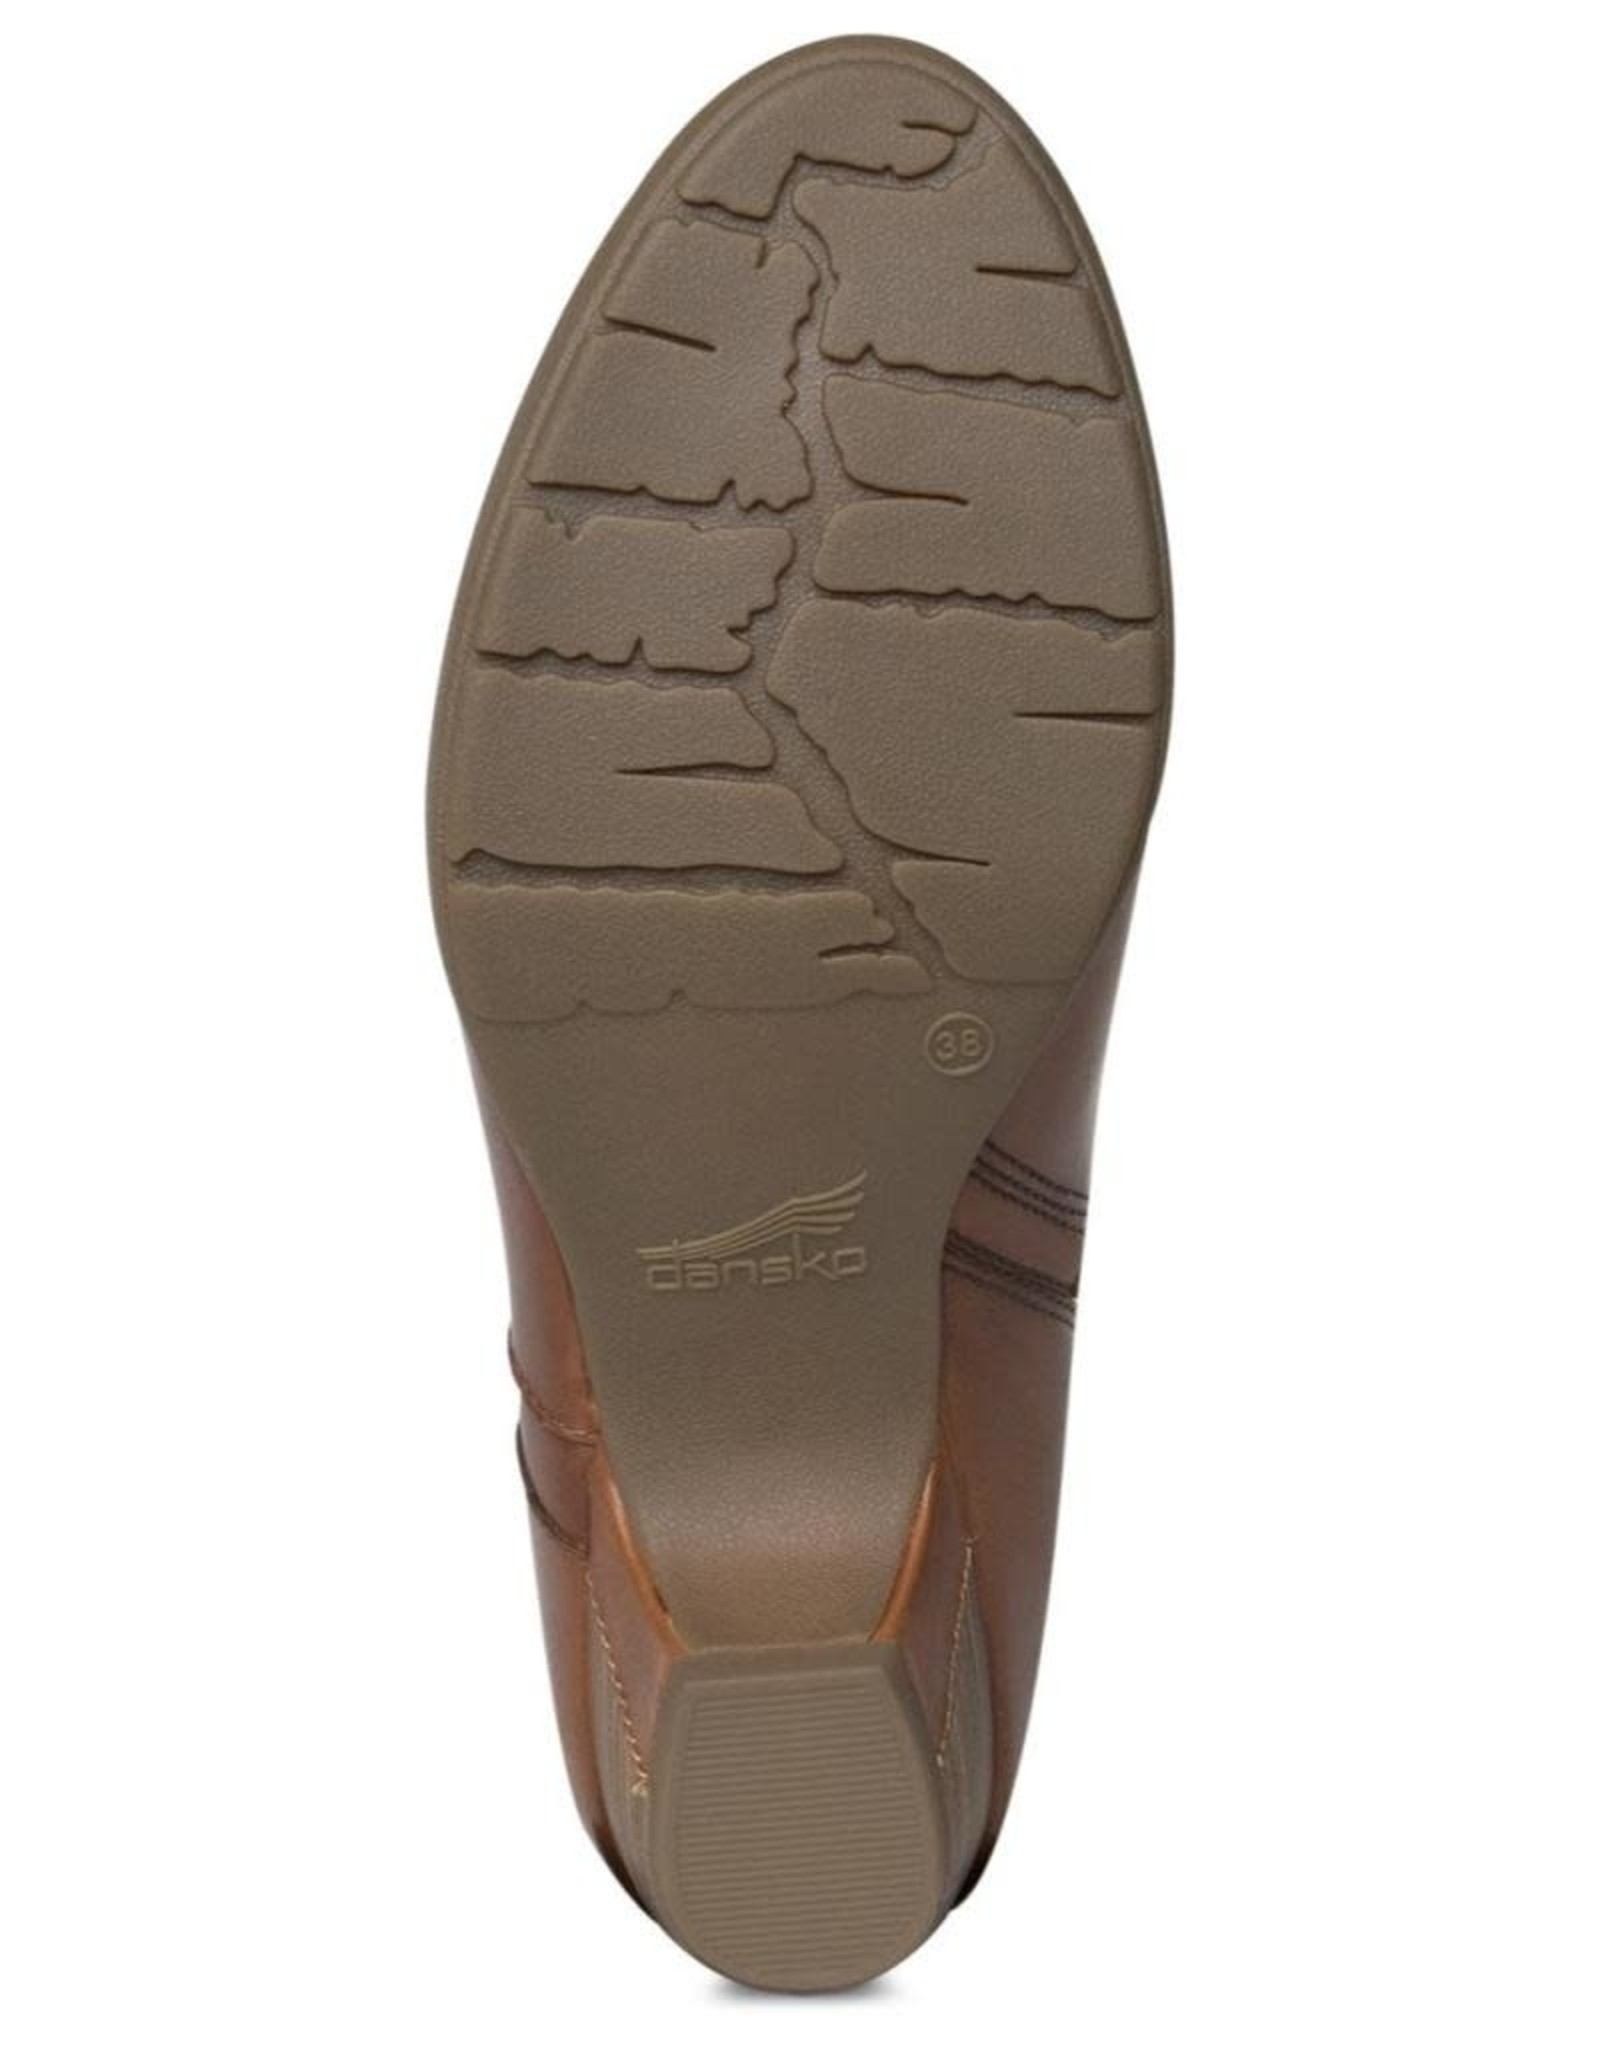 Dansko Dori Tall Boot